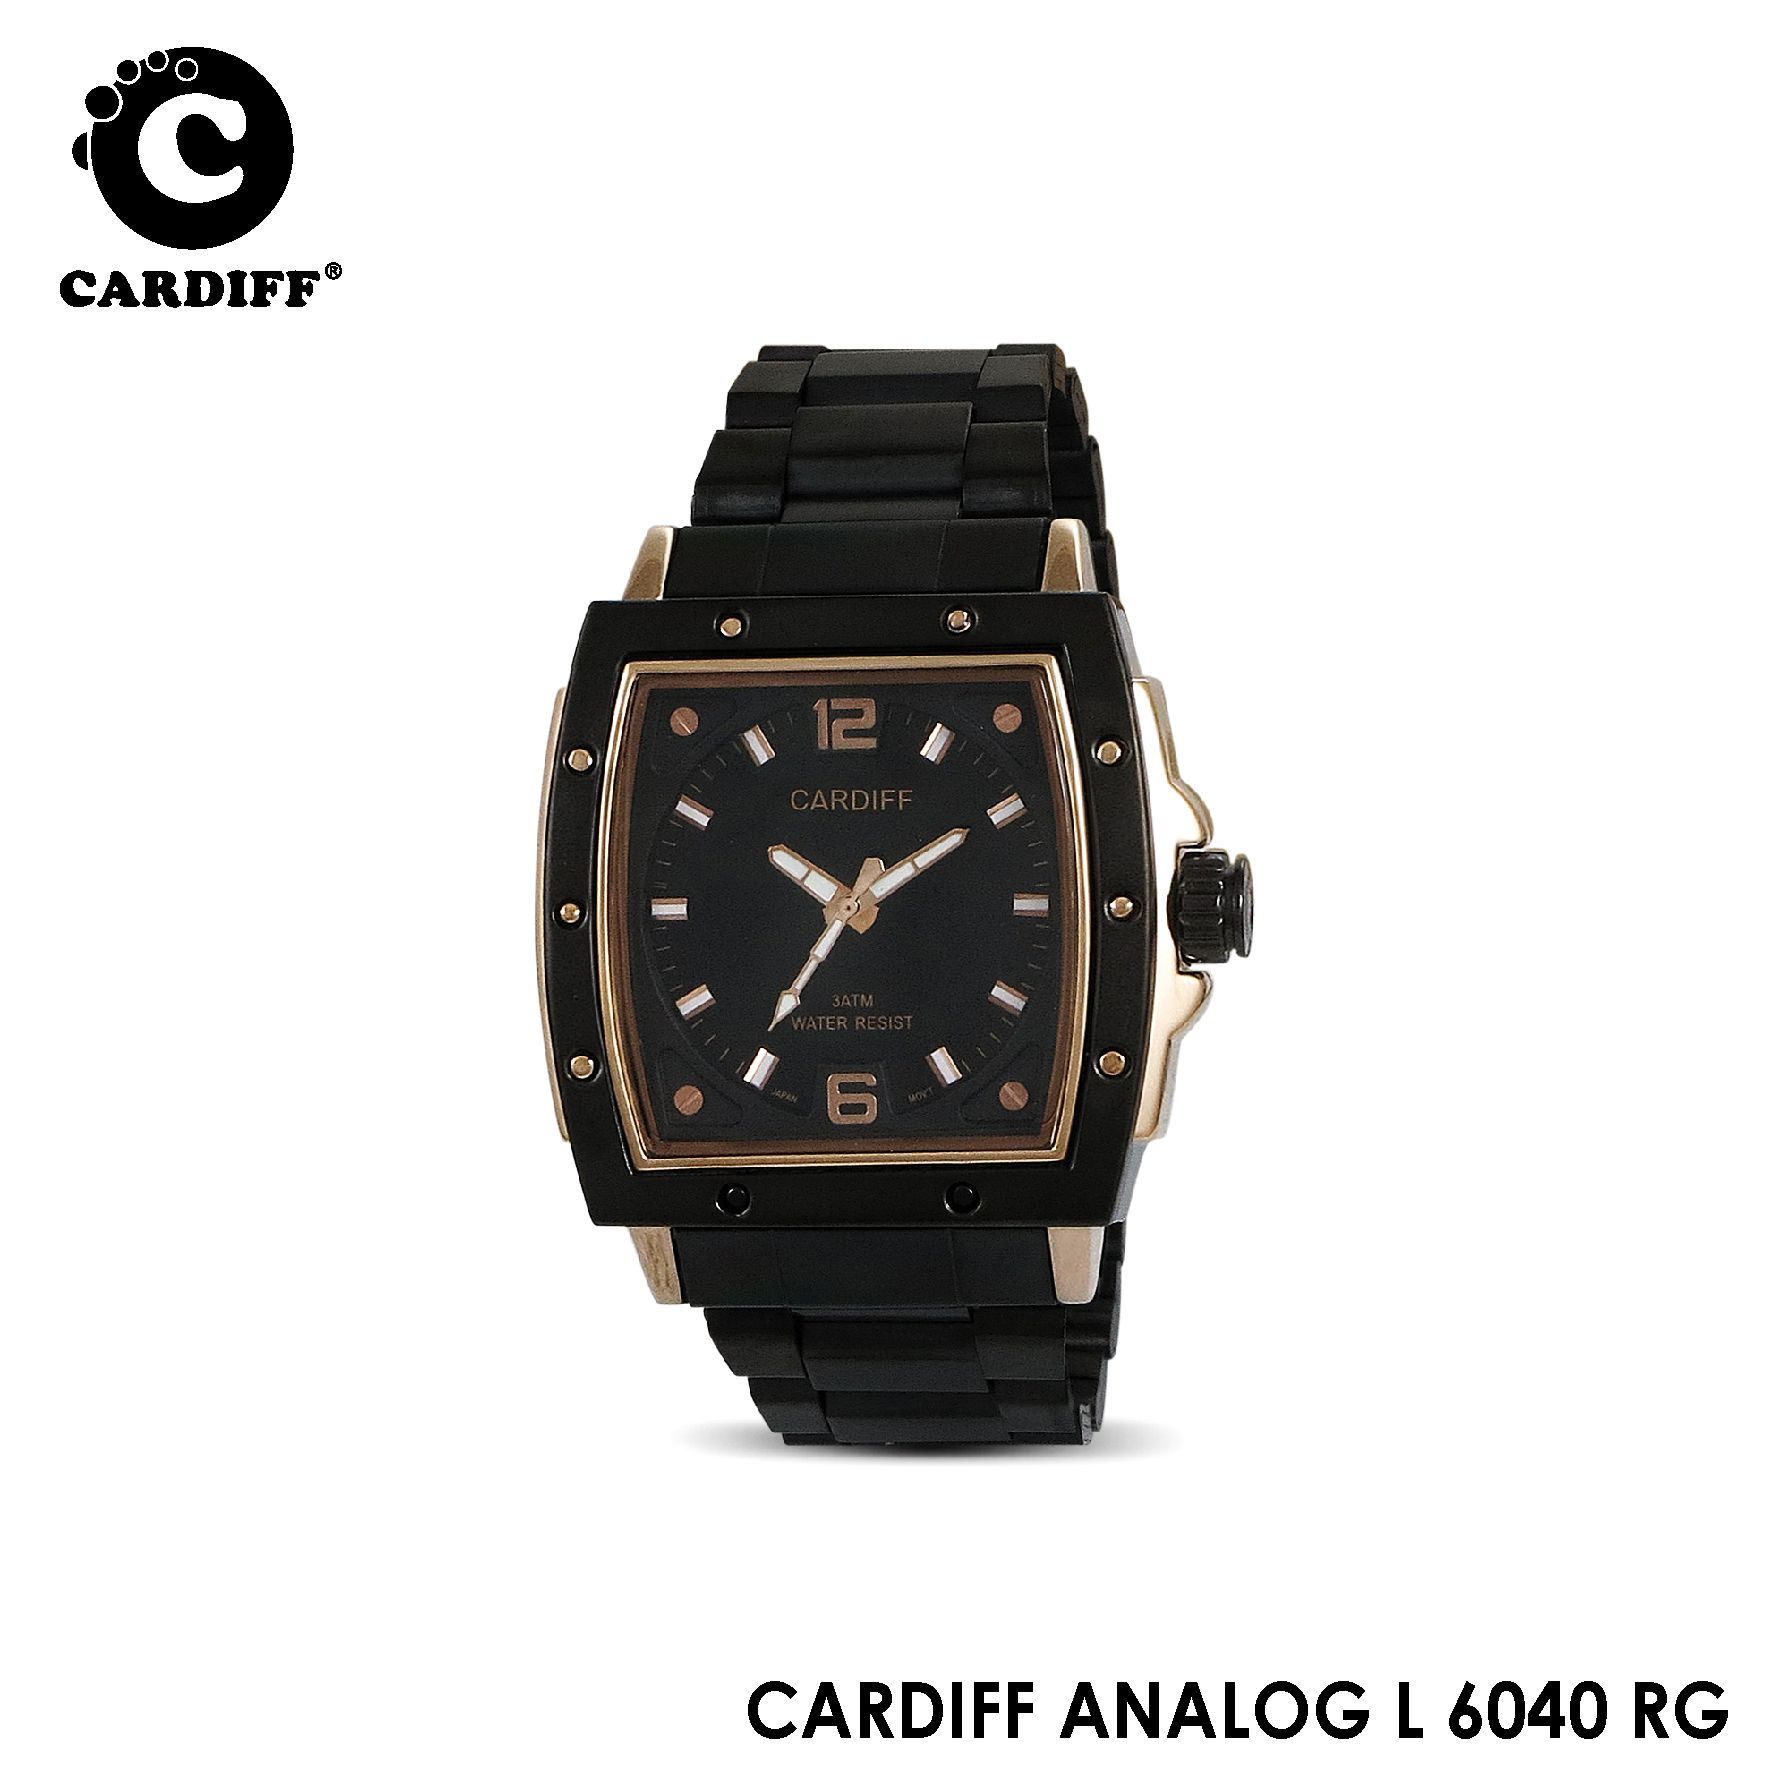 Cardiff Analog L 6040